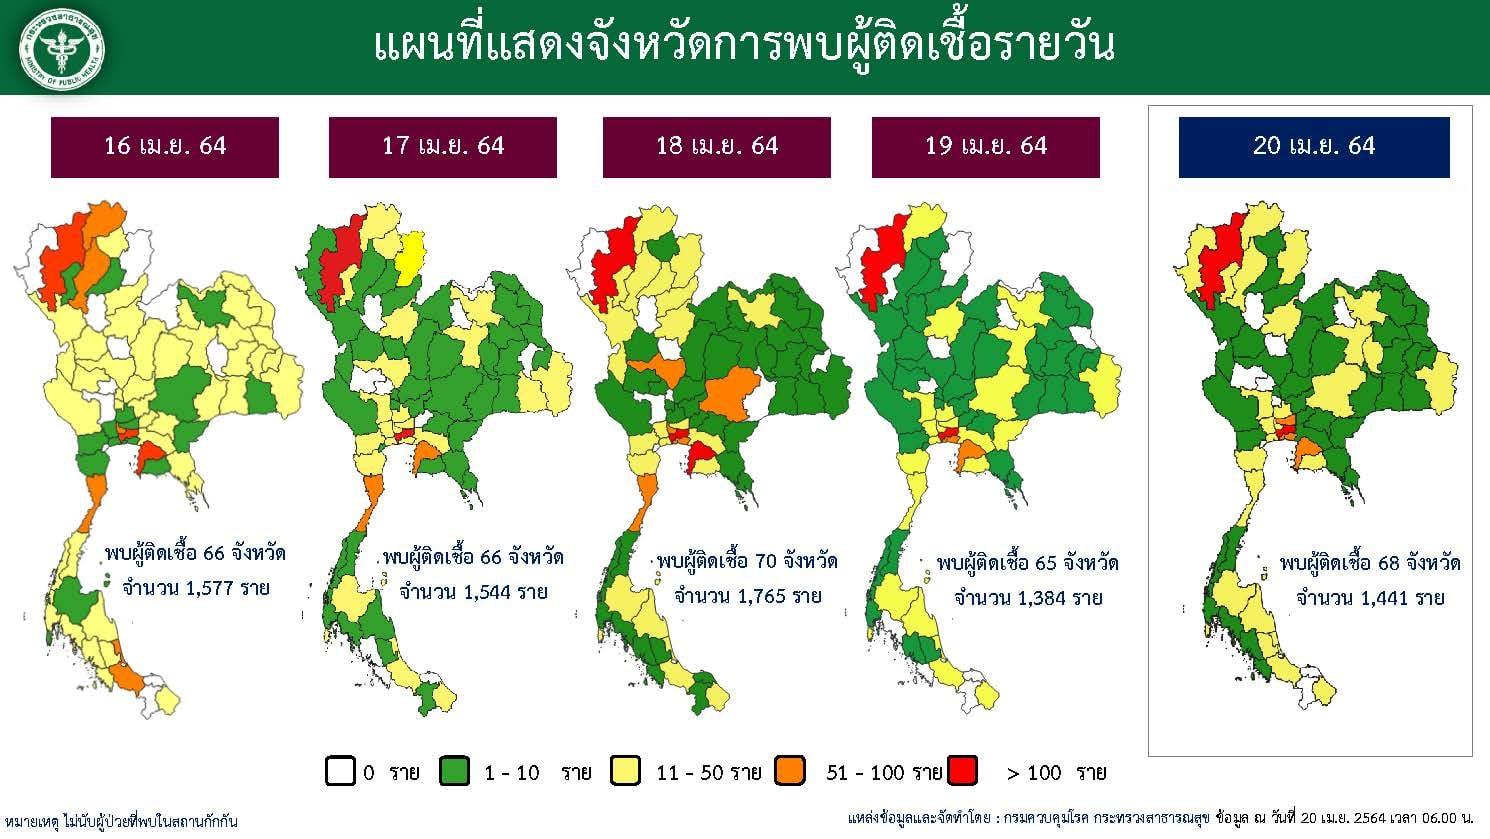 www.thaiguide.dk/images/forum/covid19/udvikling%20til%2020-04-21.jpg